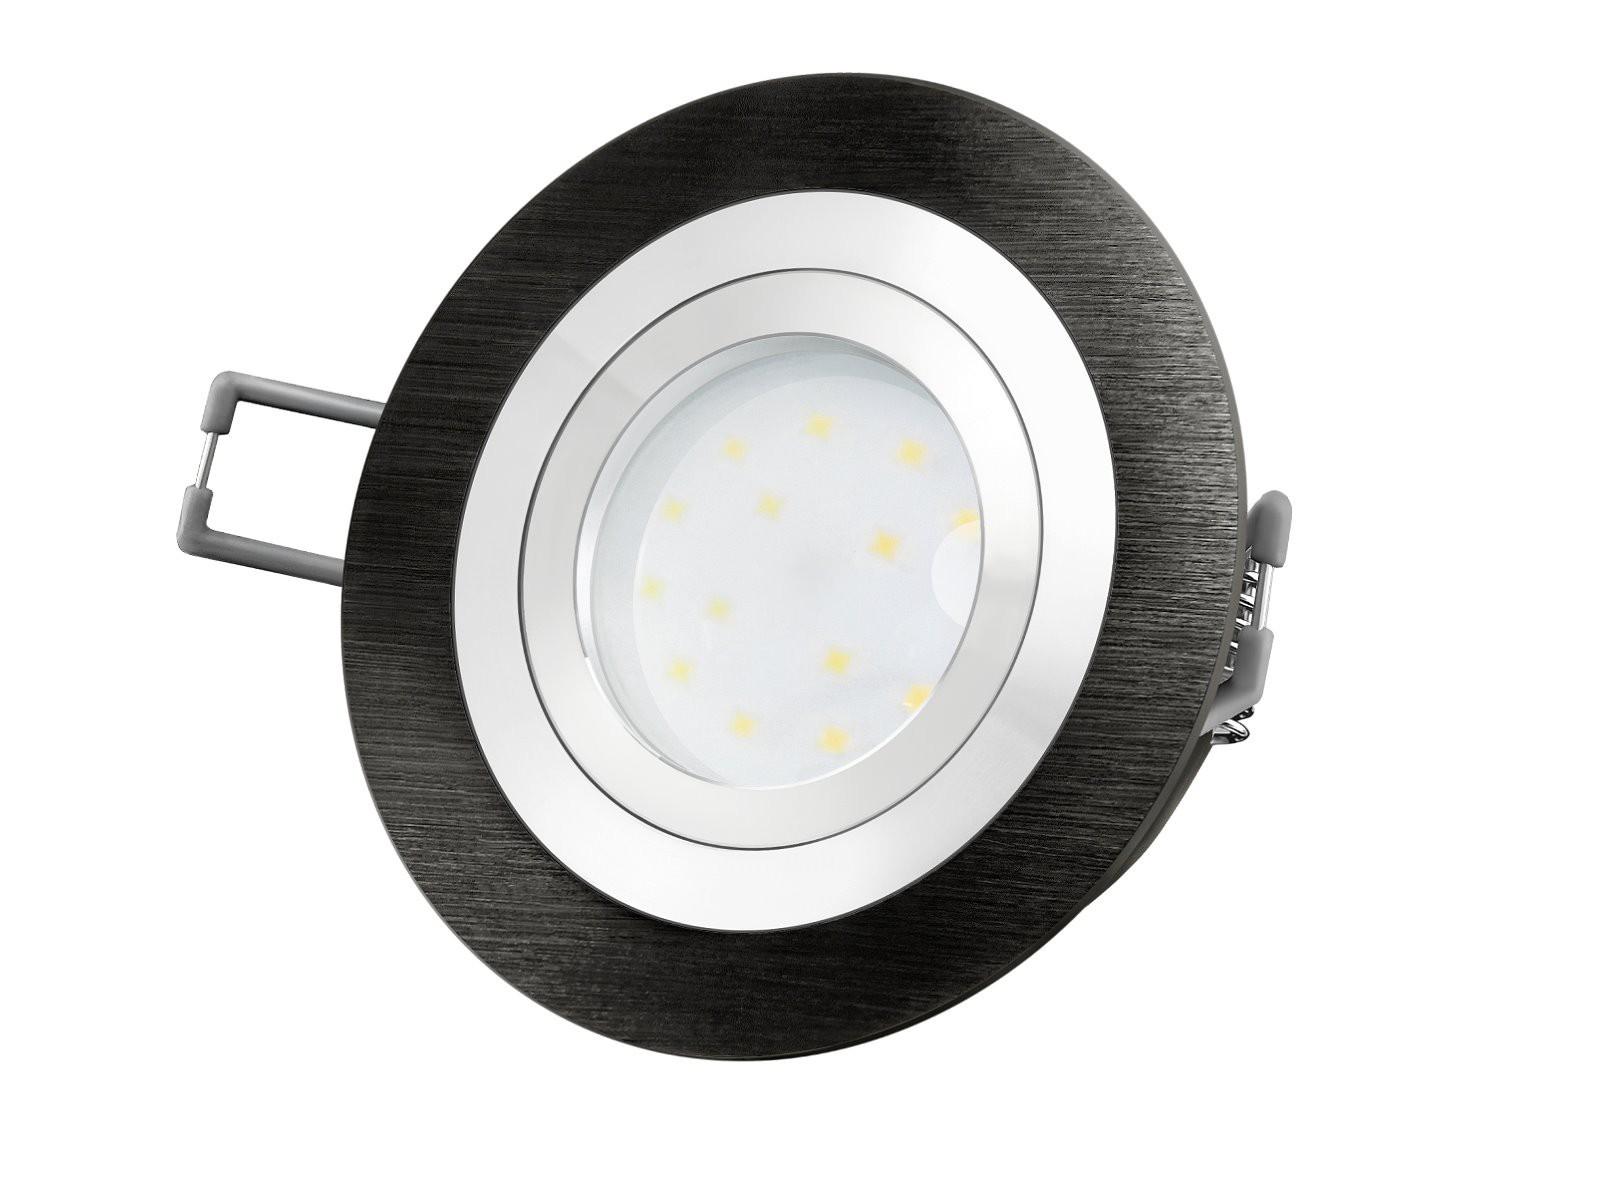 RF 2 LED Einbauspot Rund Flach Alu Schwarz Gebürstet, LED Modul 230V